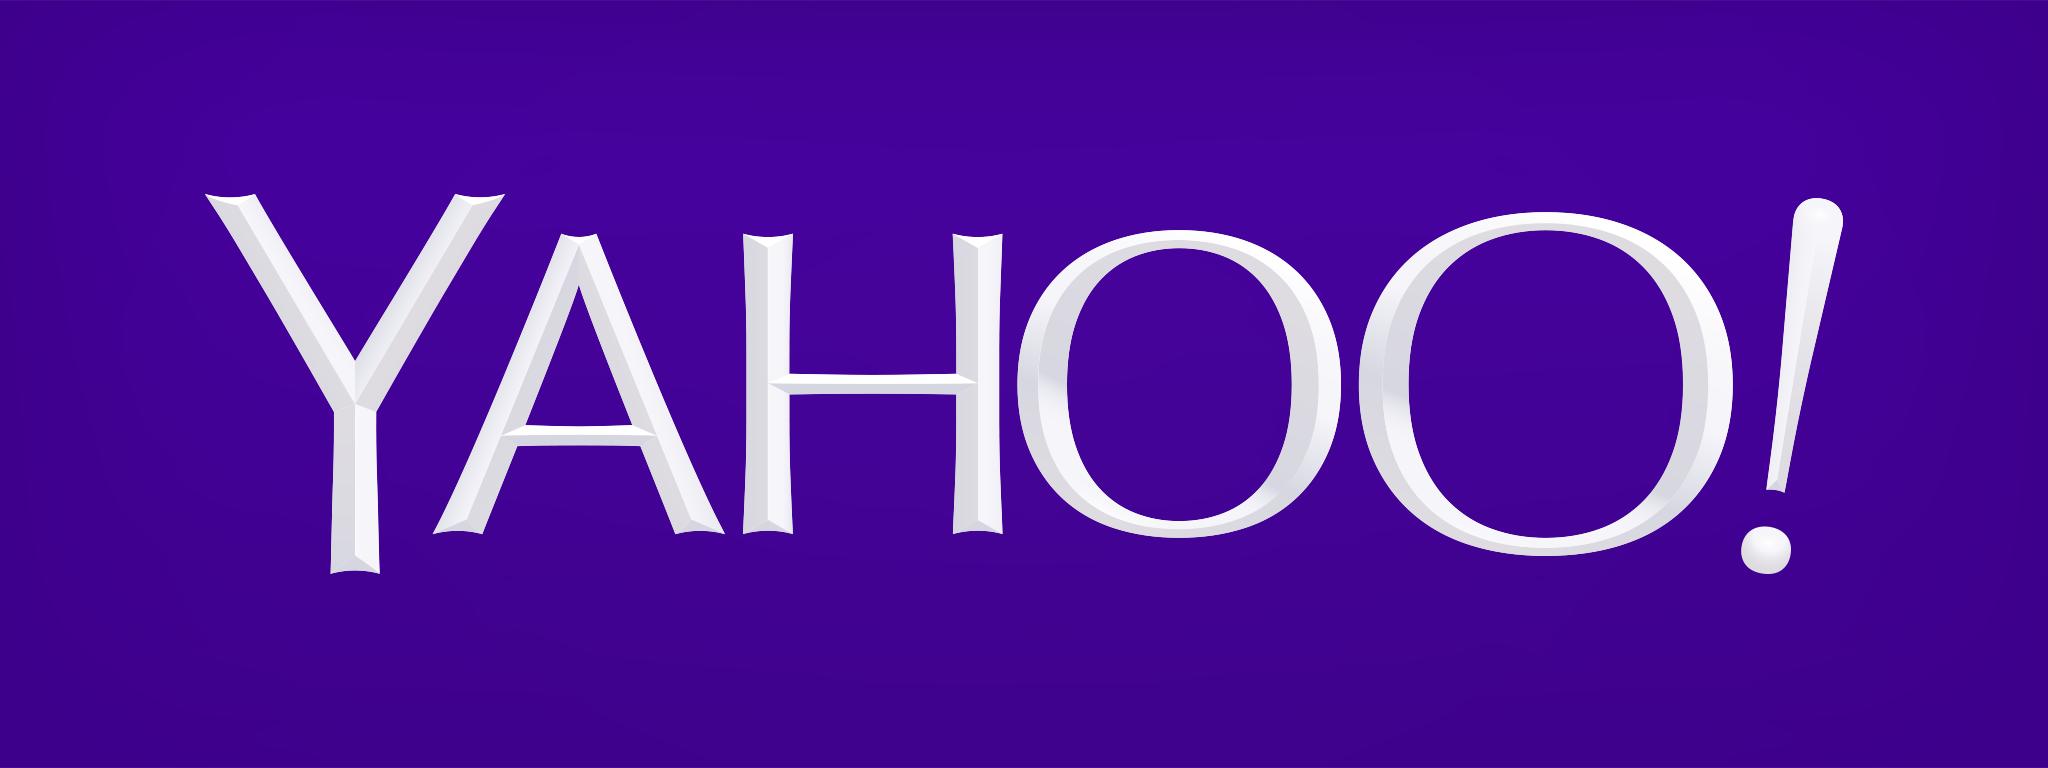 Yahoo_Logo_Purple.png - Yahoo Old Logo Vector PNG